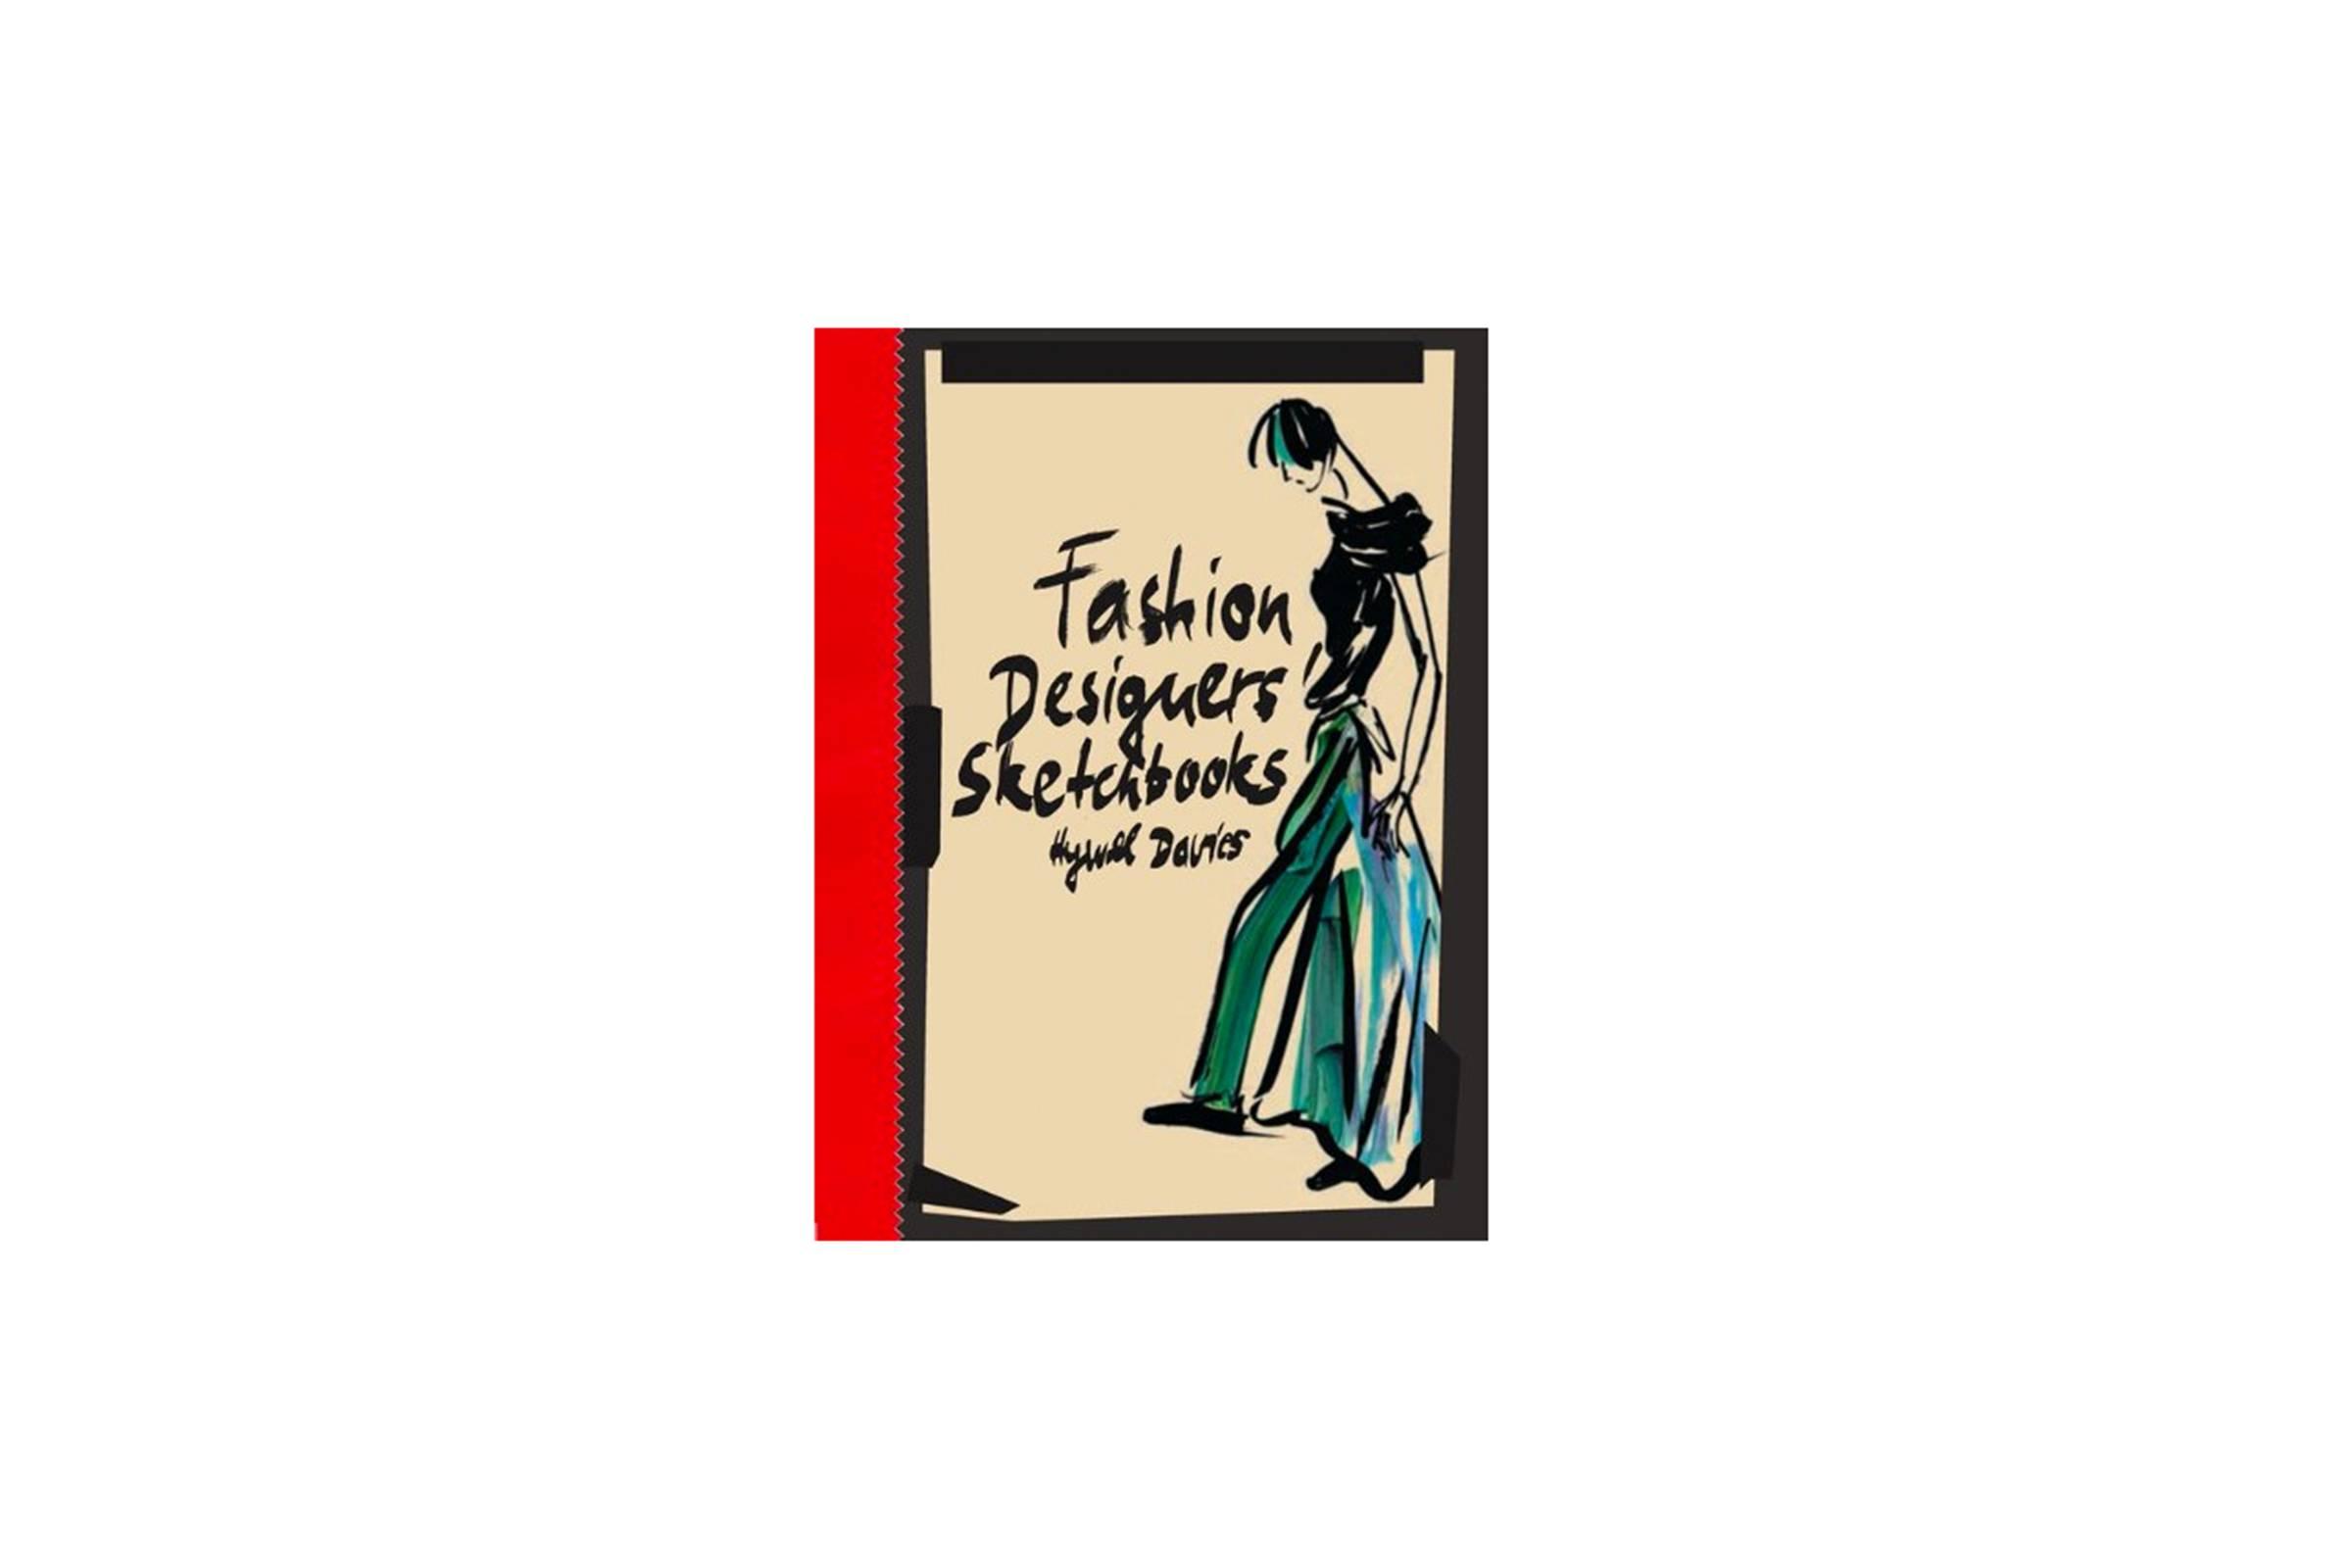 Fashion Designer Sketchbooks by Hywel Davies